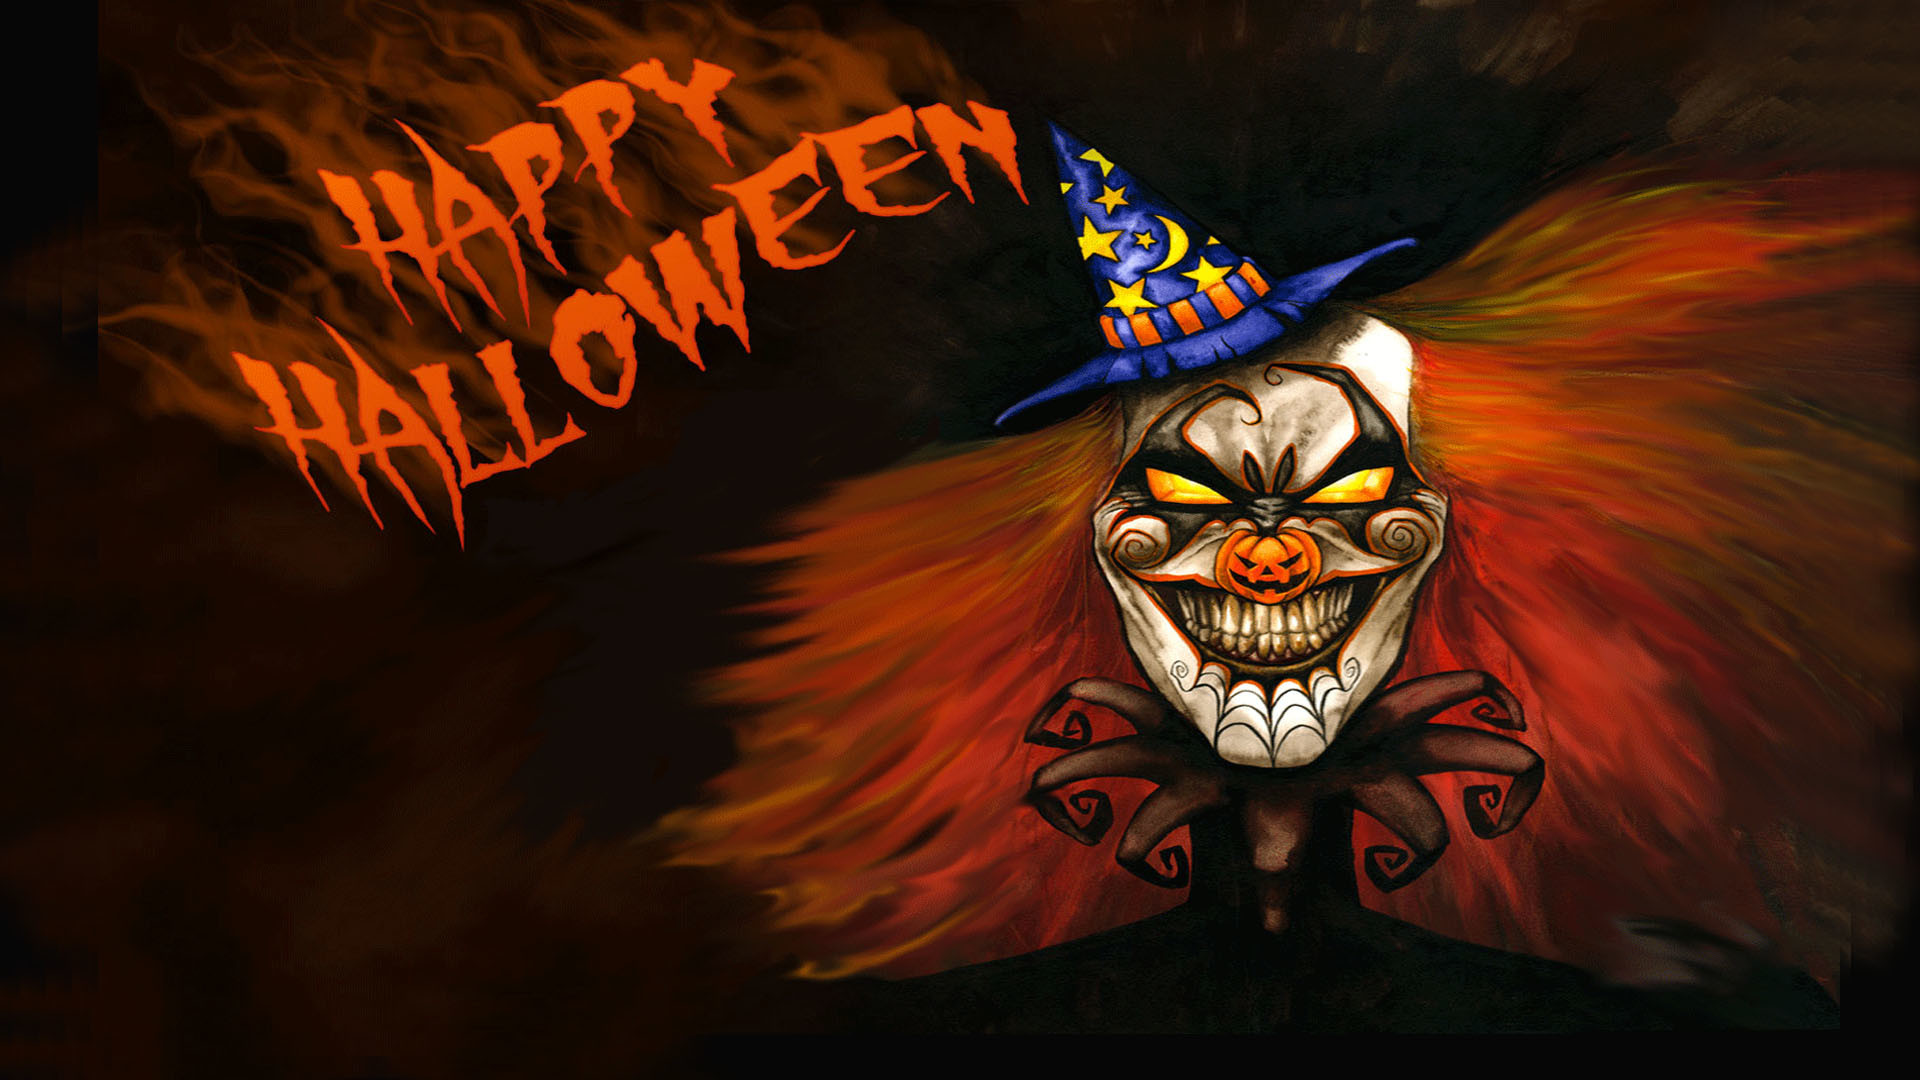 Fantastic Wallpaper Halloween Steampunk - 545497  Trends_648497.jpg